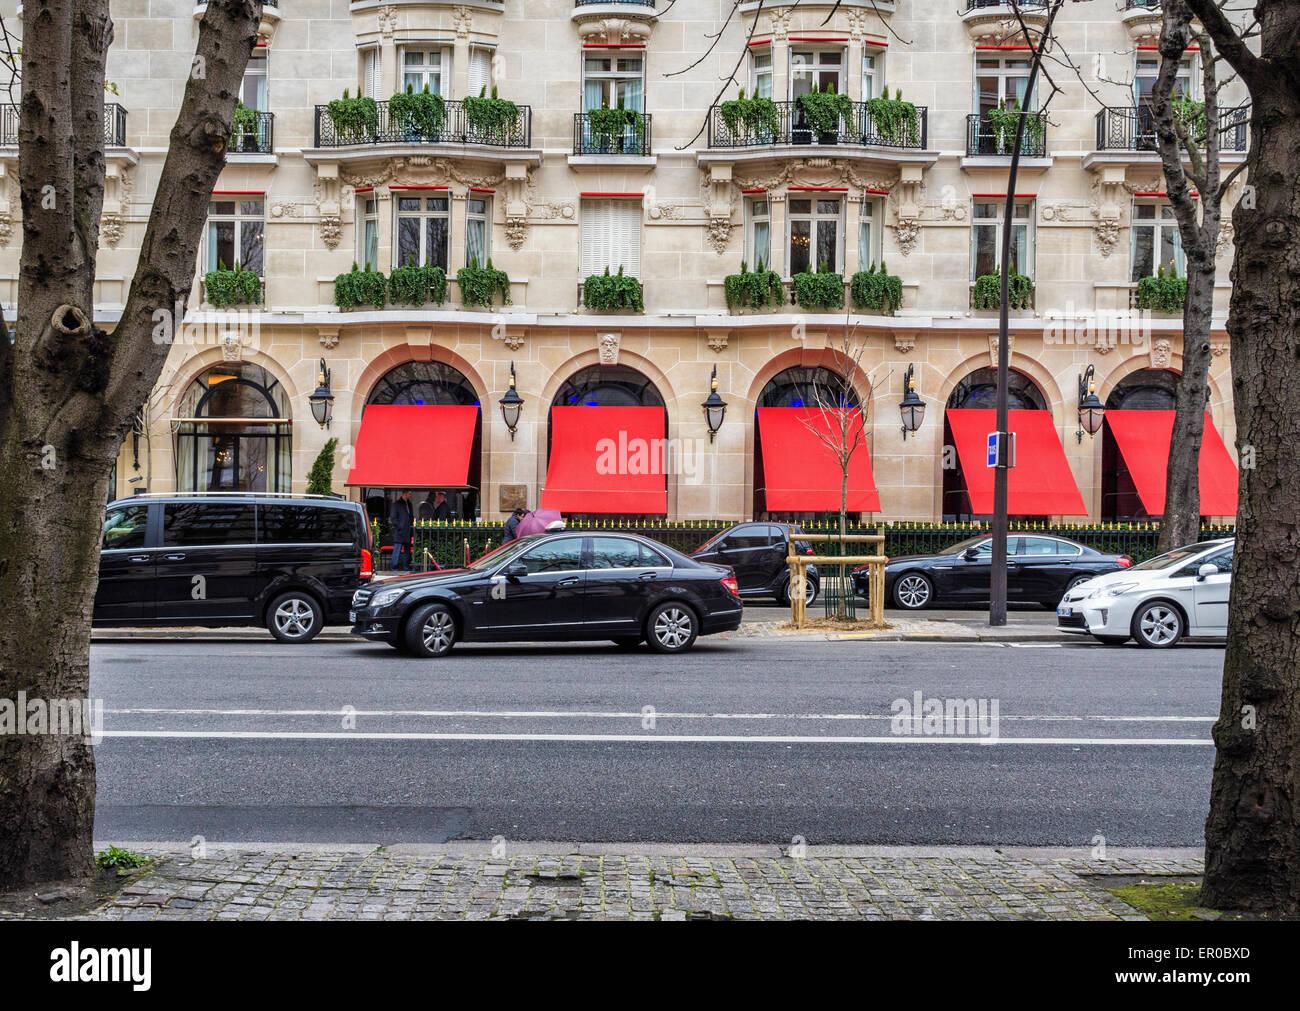 Hotel Plaza Athenee, exterior of luxury 5 star hotel on the Avenue Montaigne, Paris - Stock Image